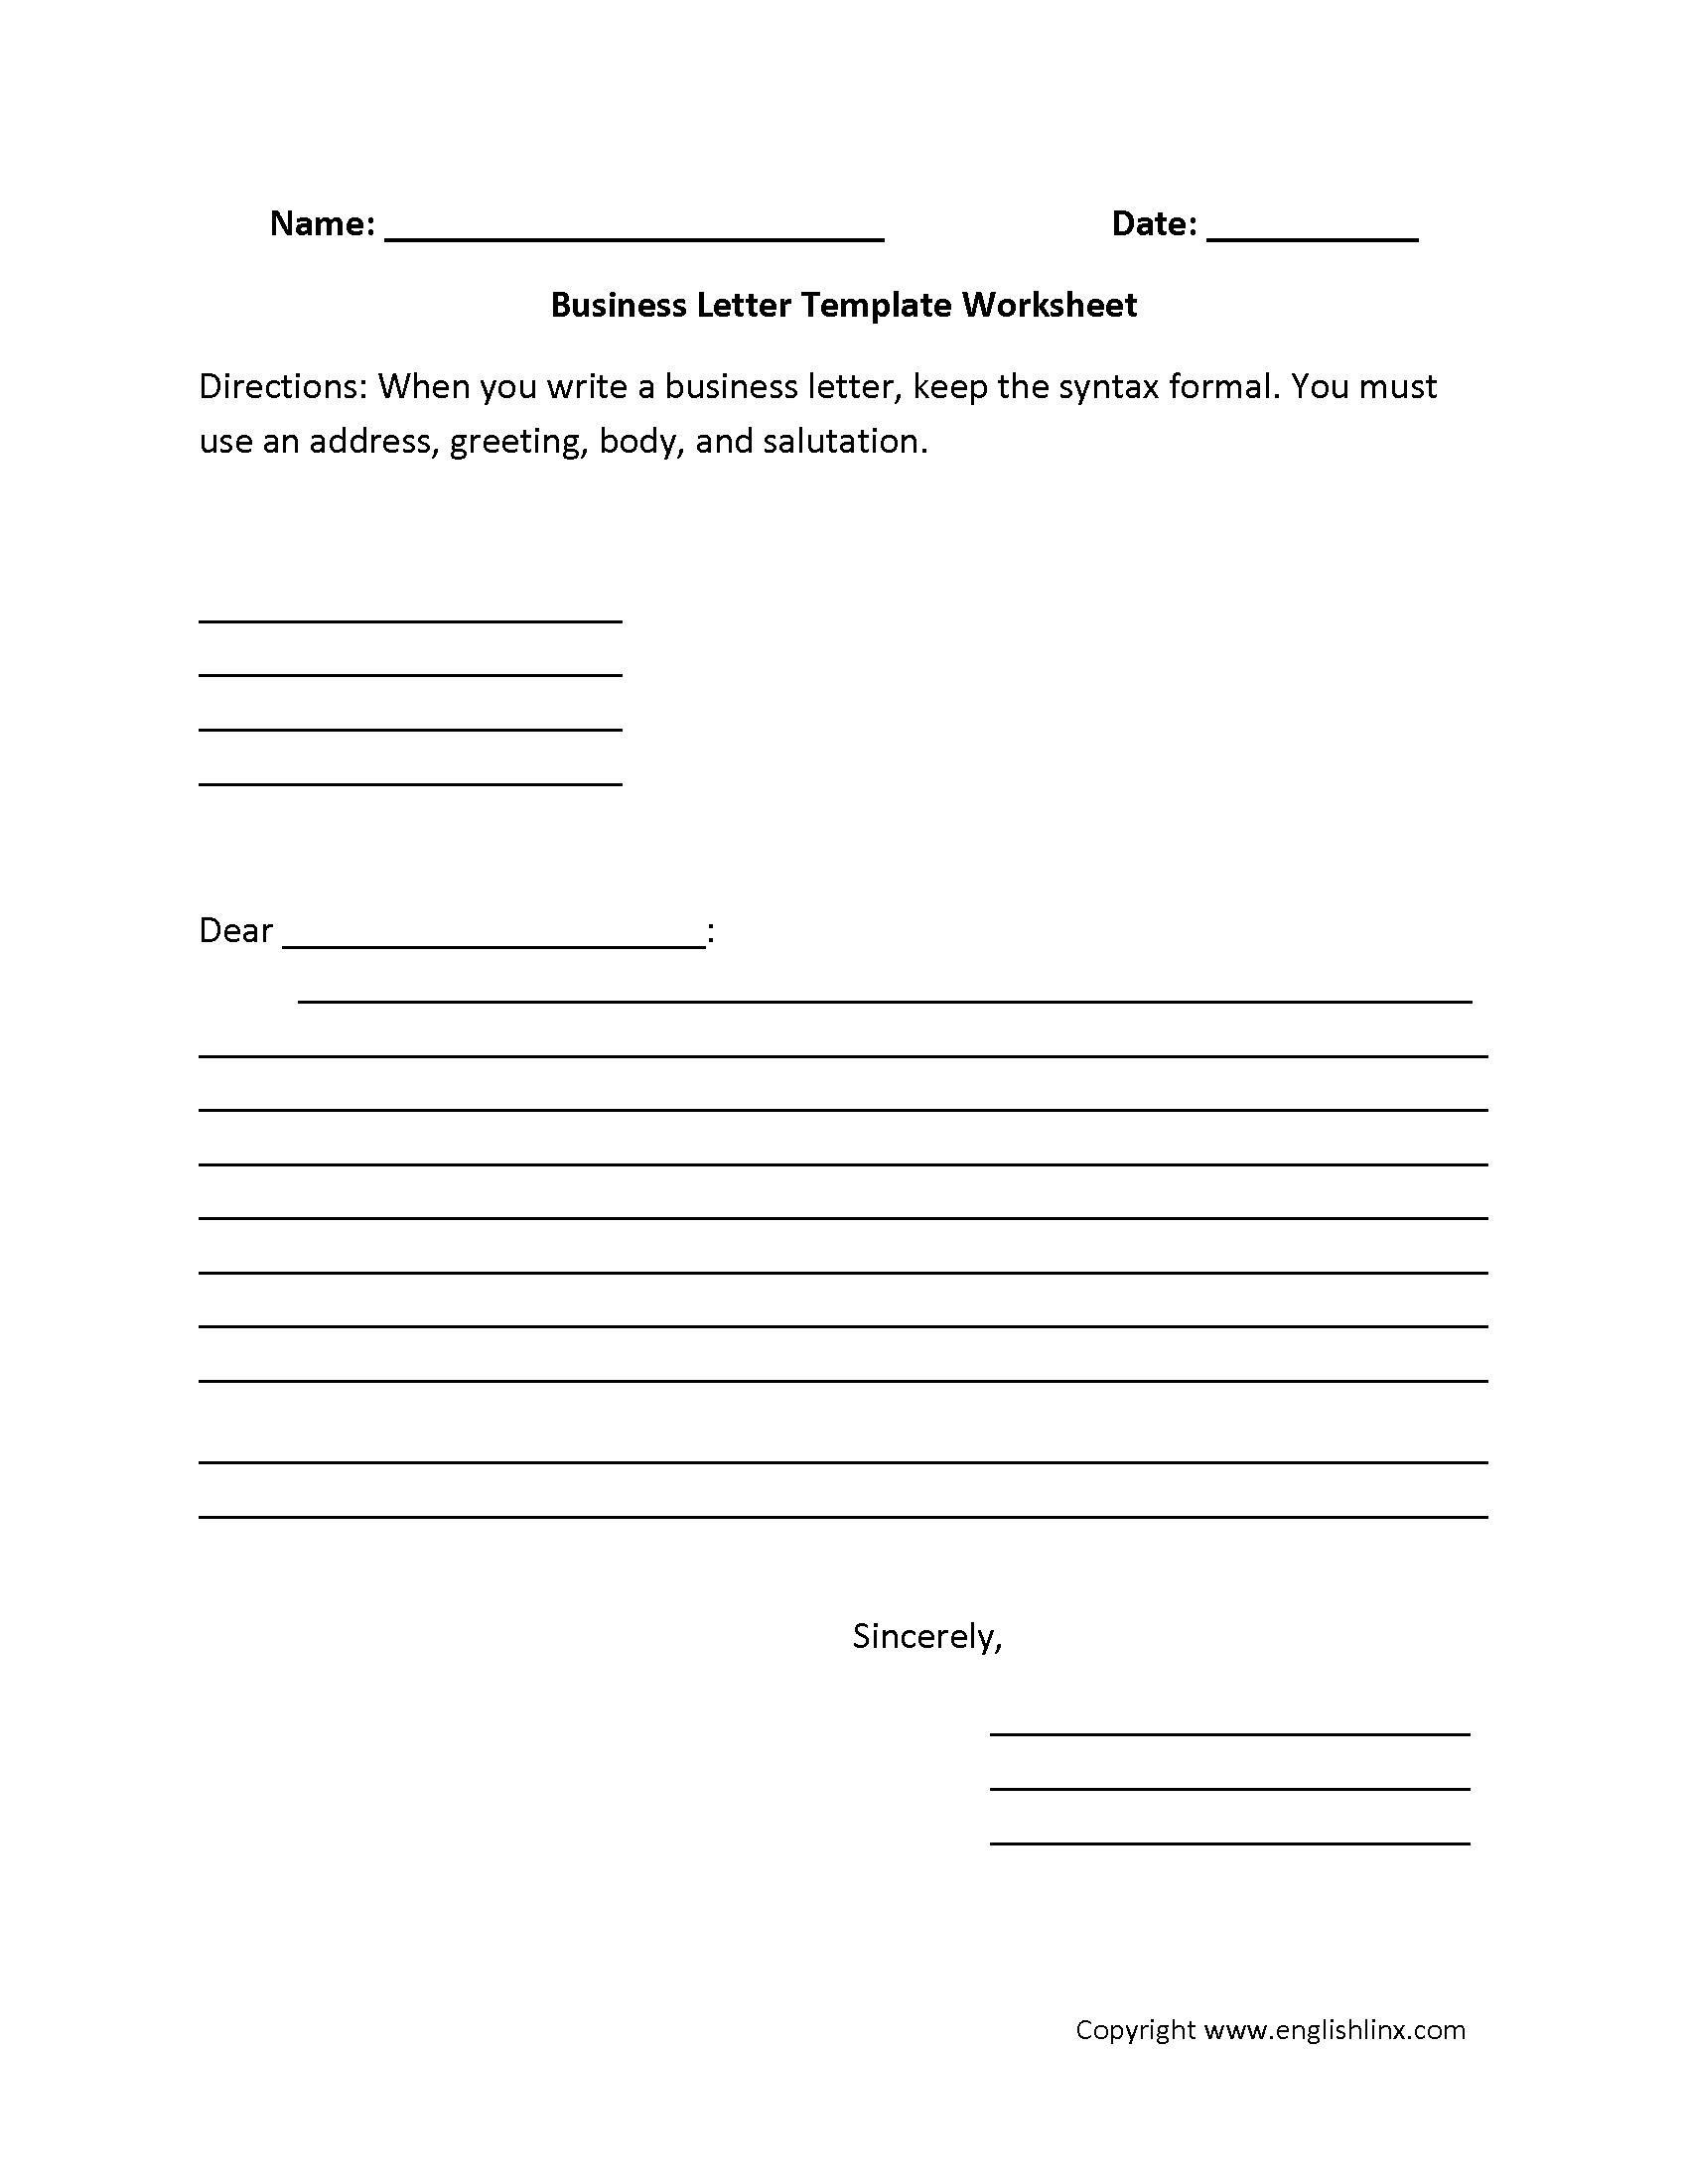 Letter Writing Worksheets | Business Letter Writing Worksheets inside Letter Writing Worksheets For Grade 5